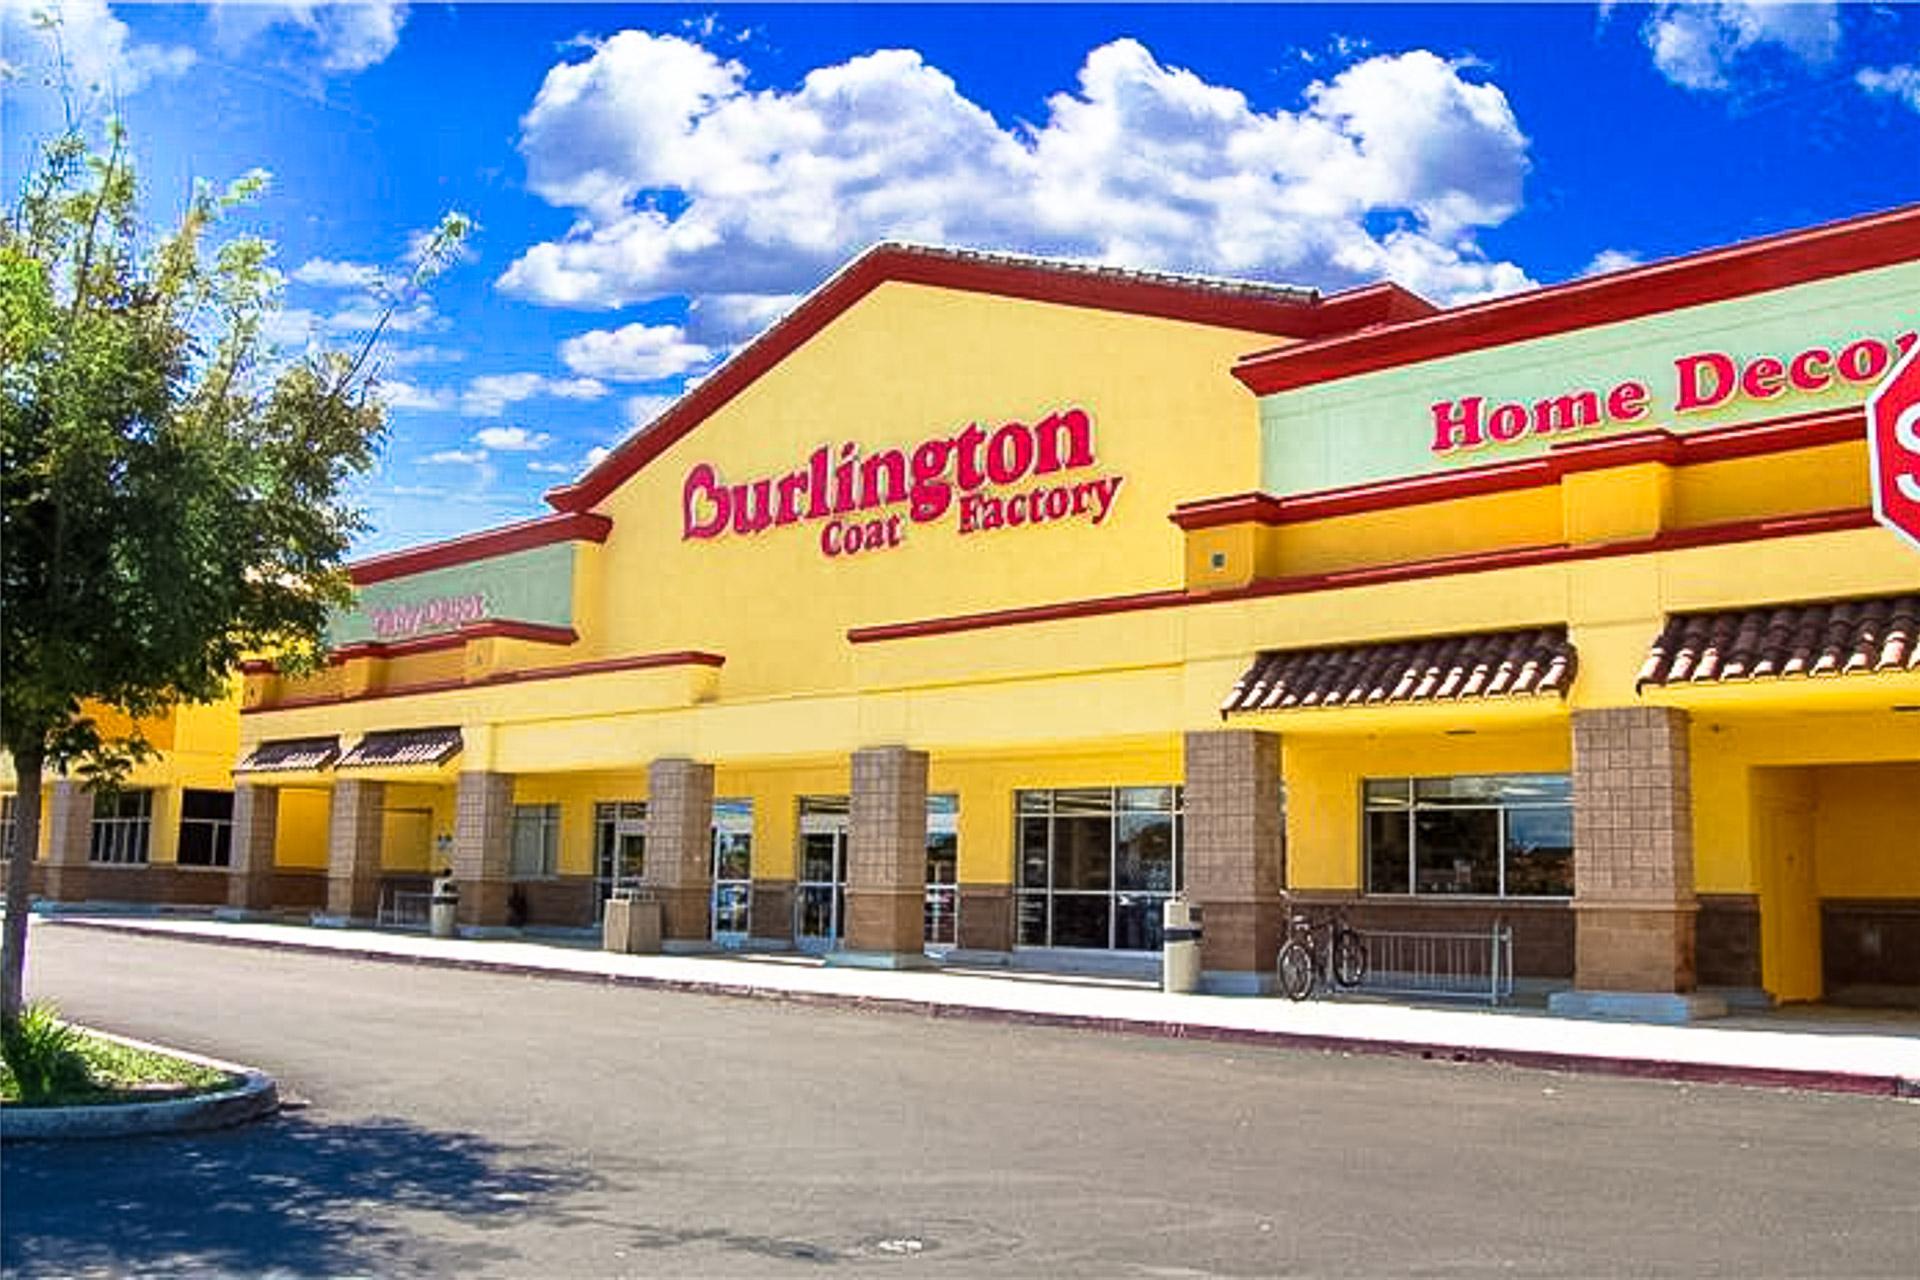 track record recently closed transactions nnn fitness burlington coat factory